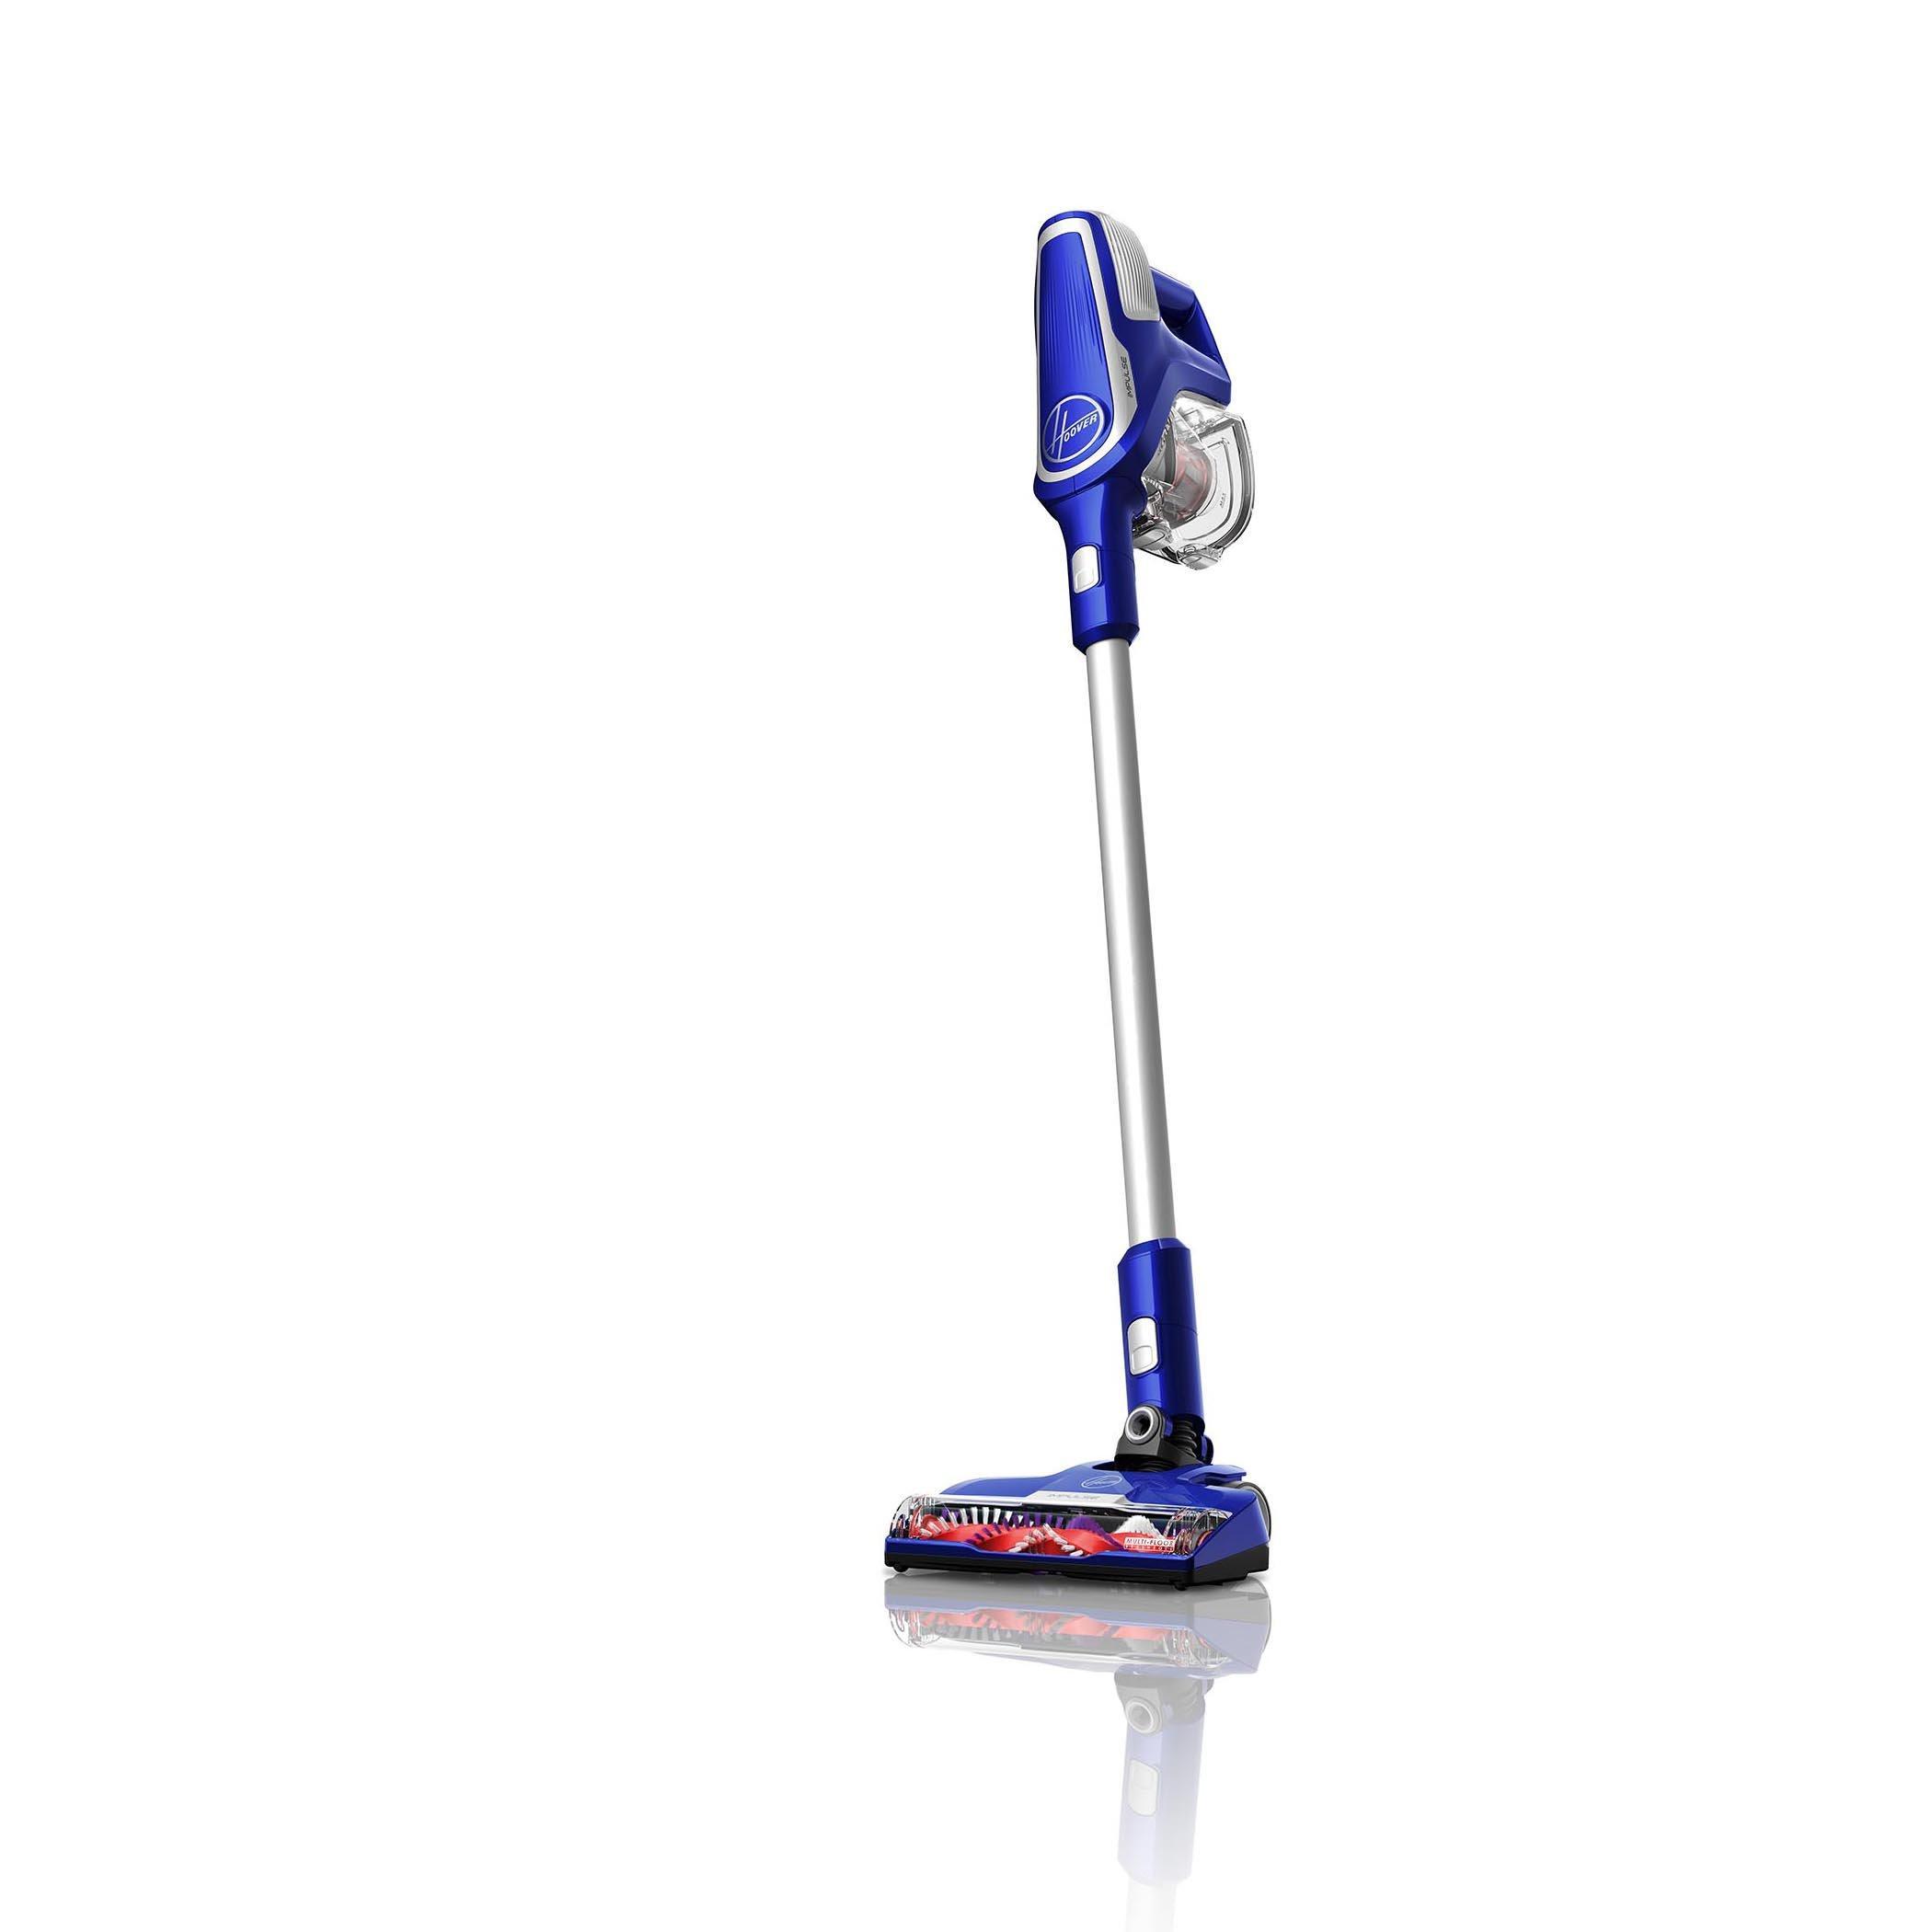 Hoover IMPULSE Cordless Vacuum2